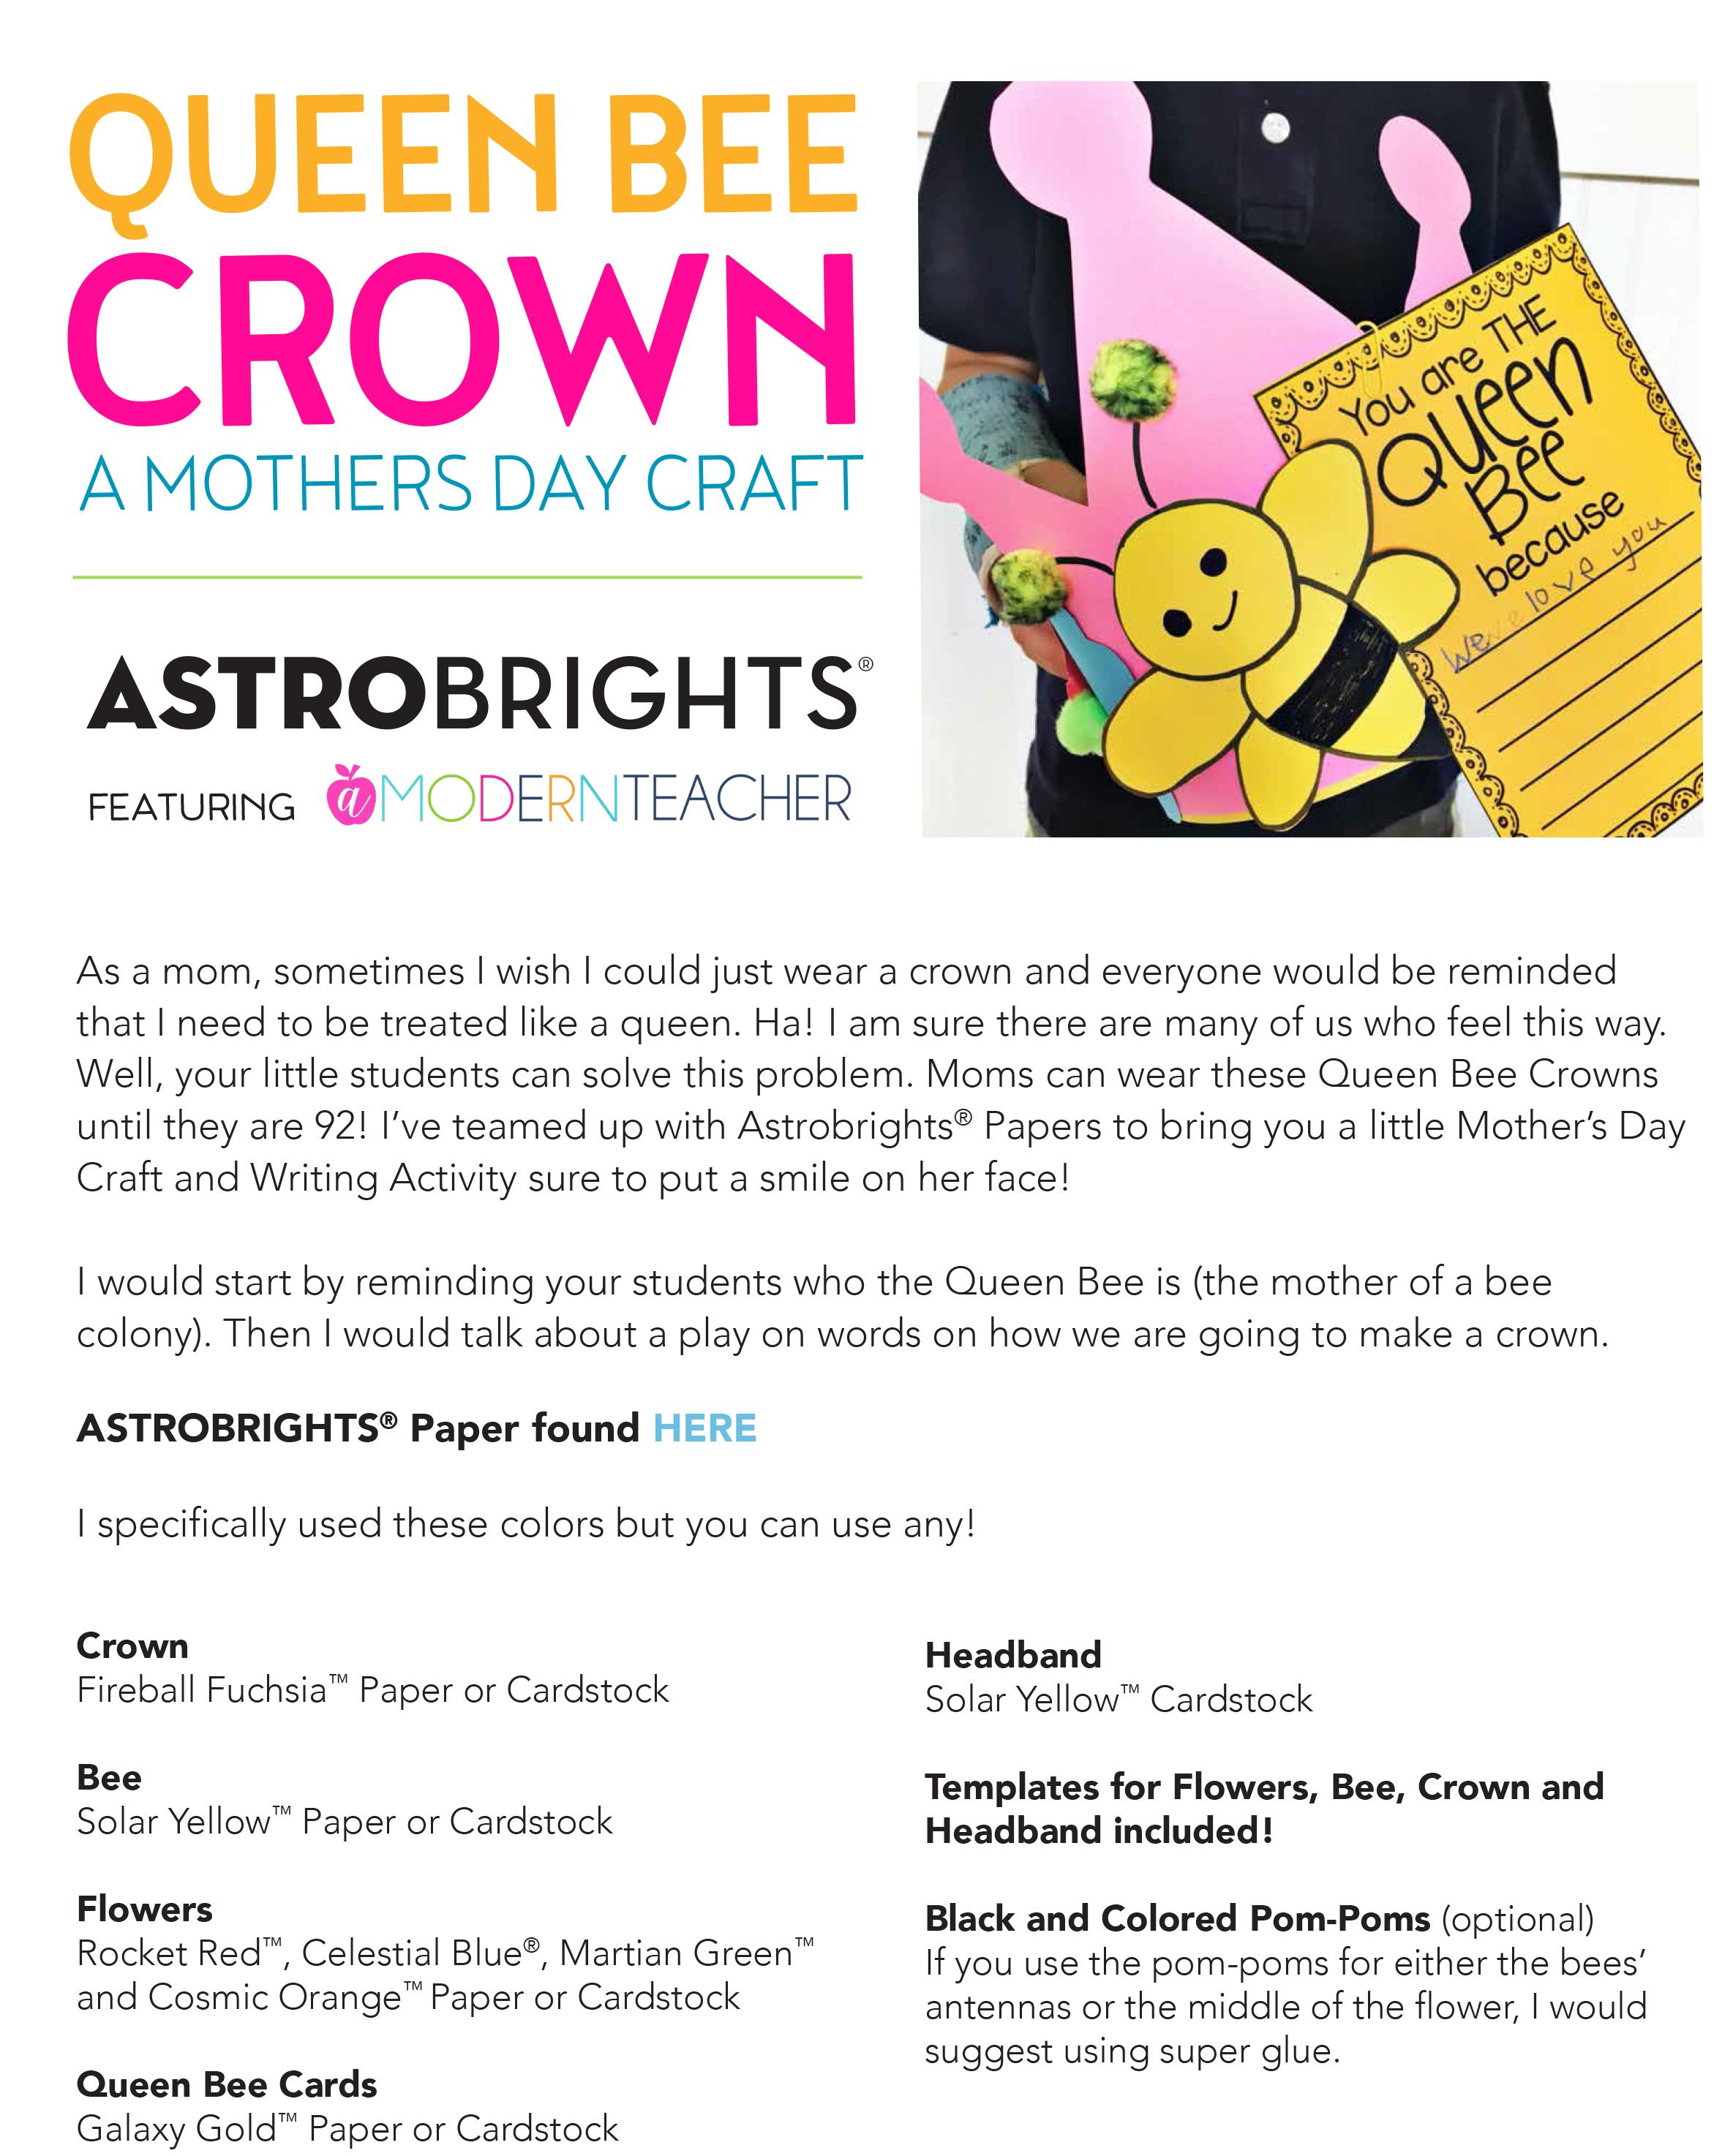 Astro-Brights